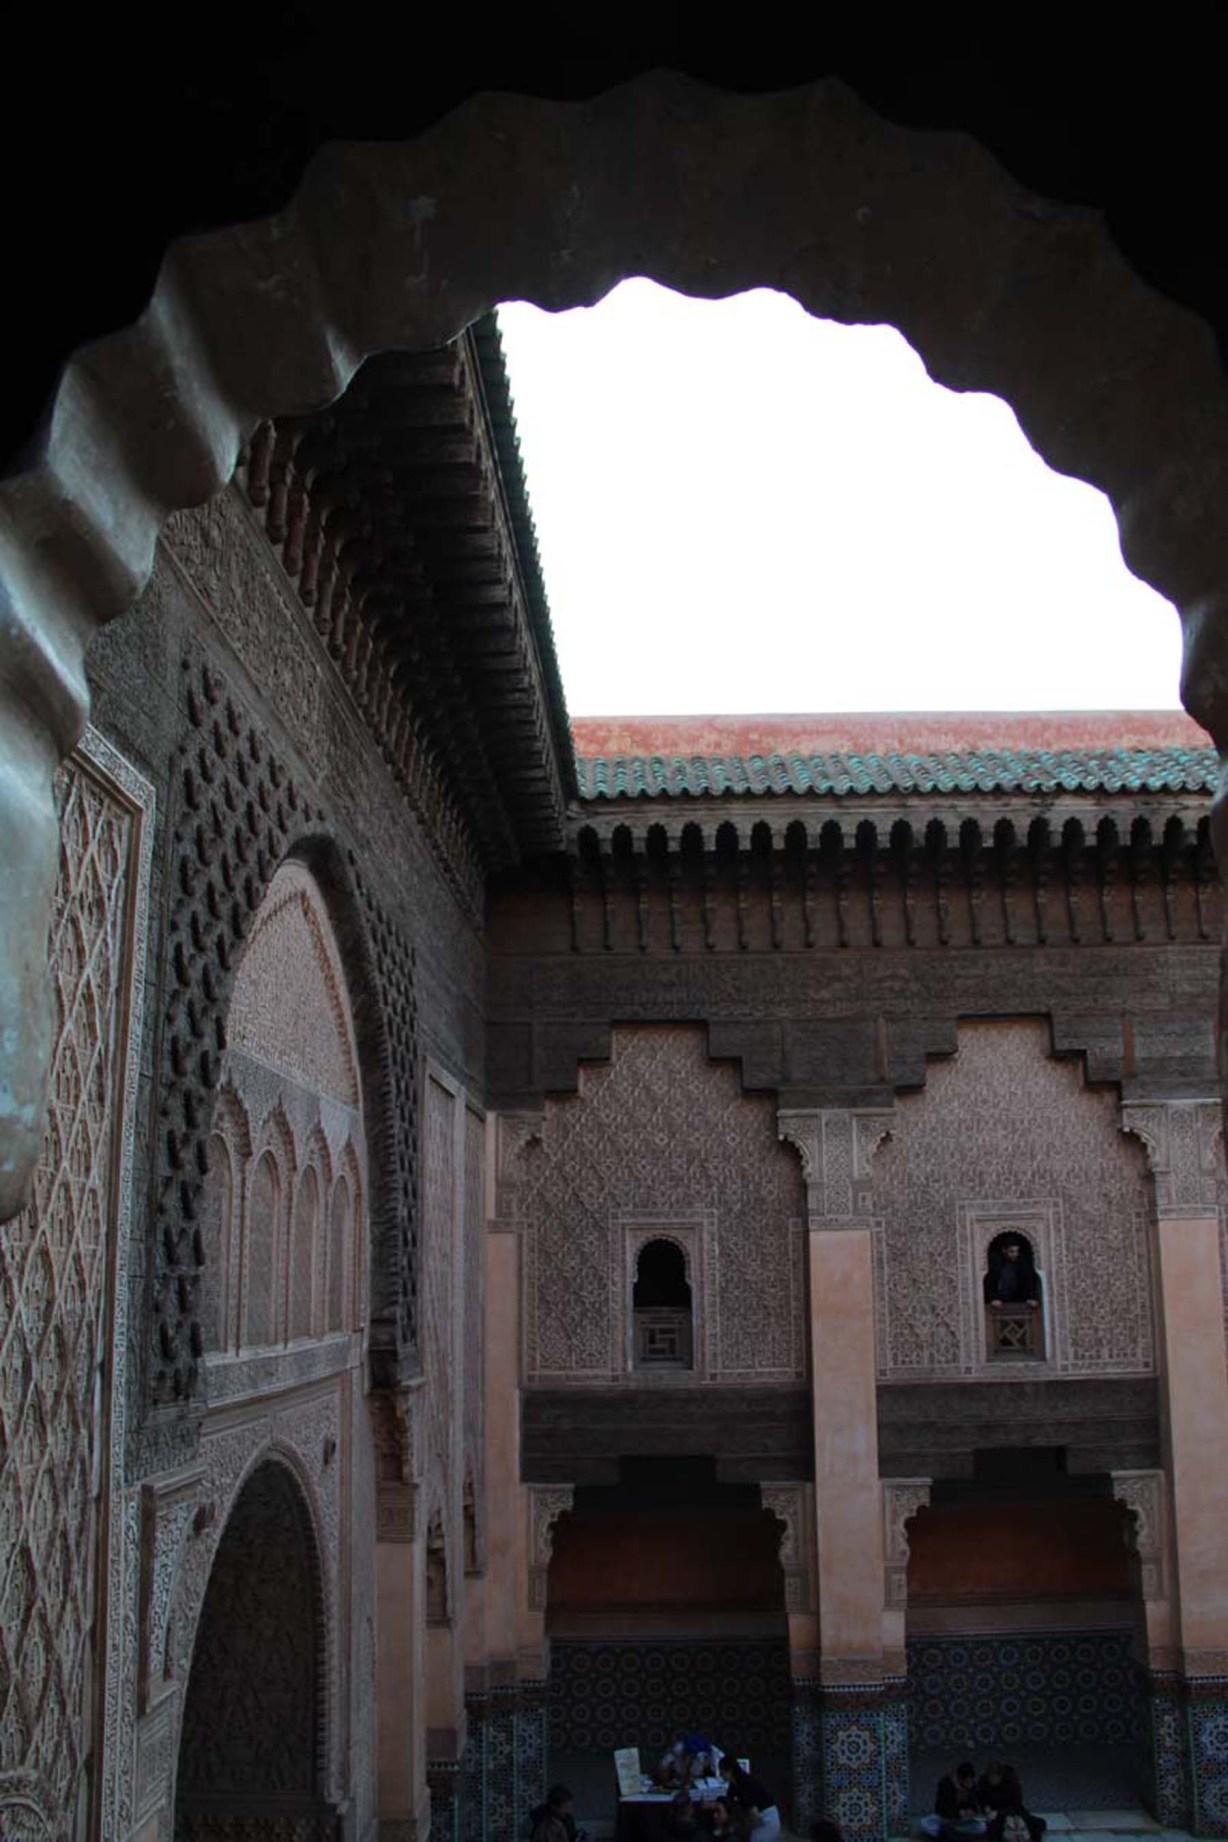 Courtyard of the Ben Youssef Madrasa in Marrakech